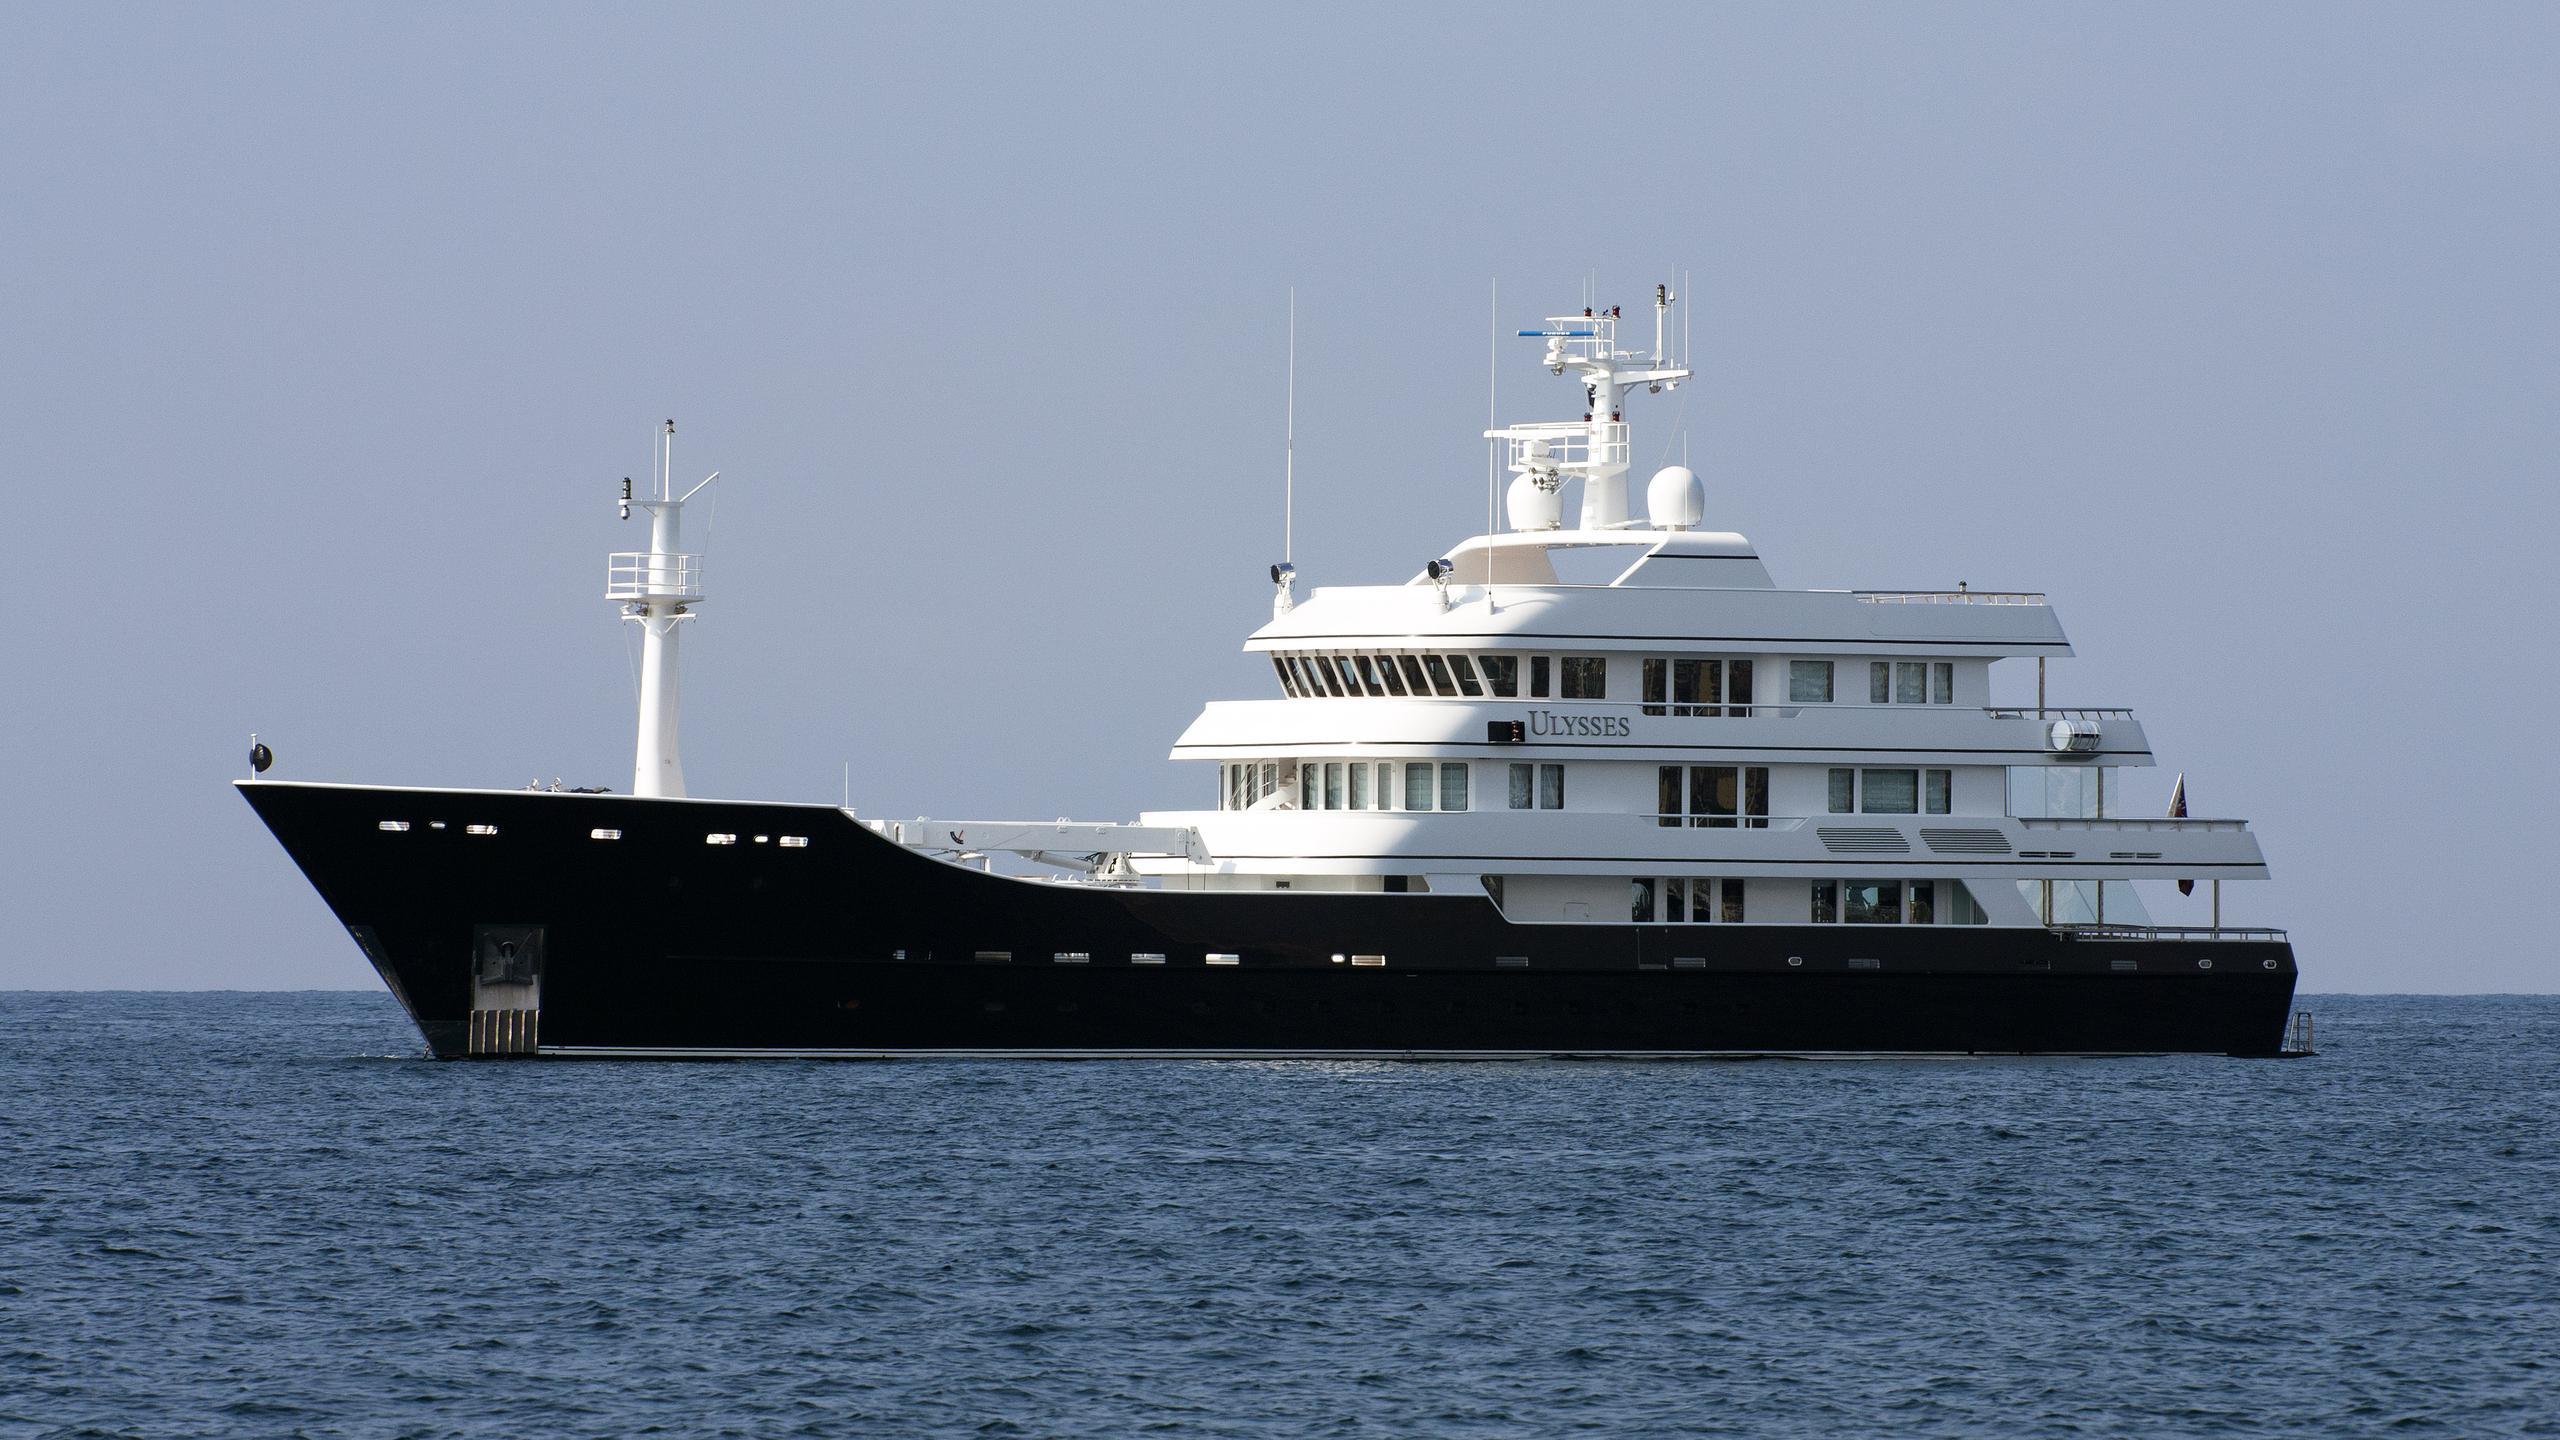 grand-rusalina-explorer-yacht-trinity-global-explorer-192-2003-59m-profile-1